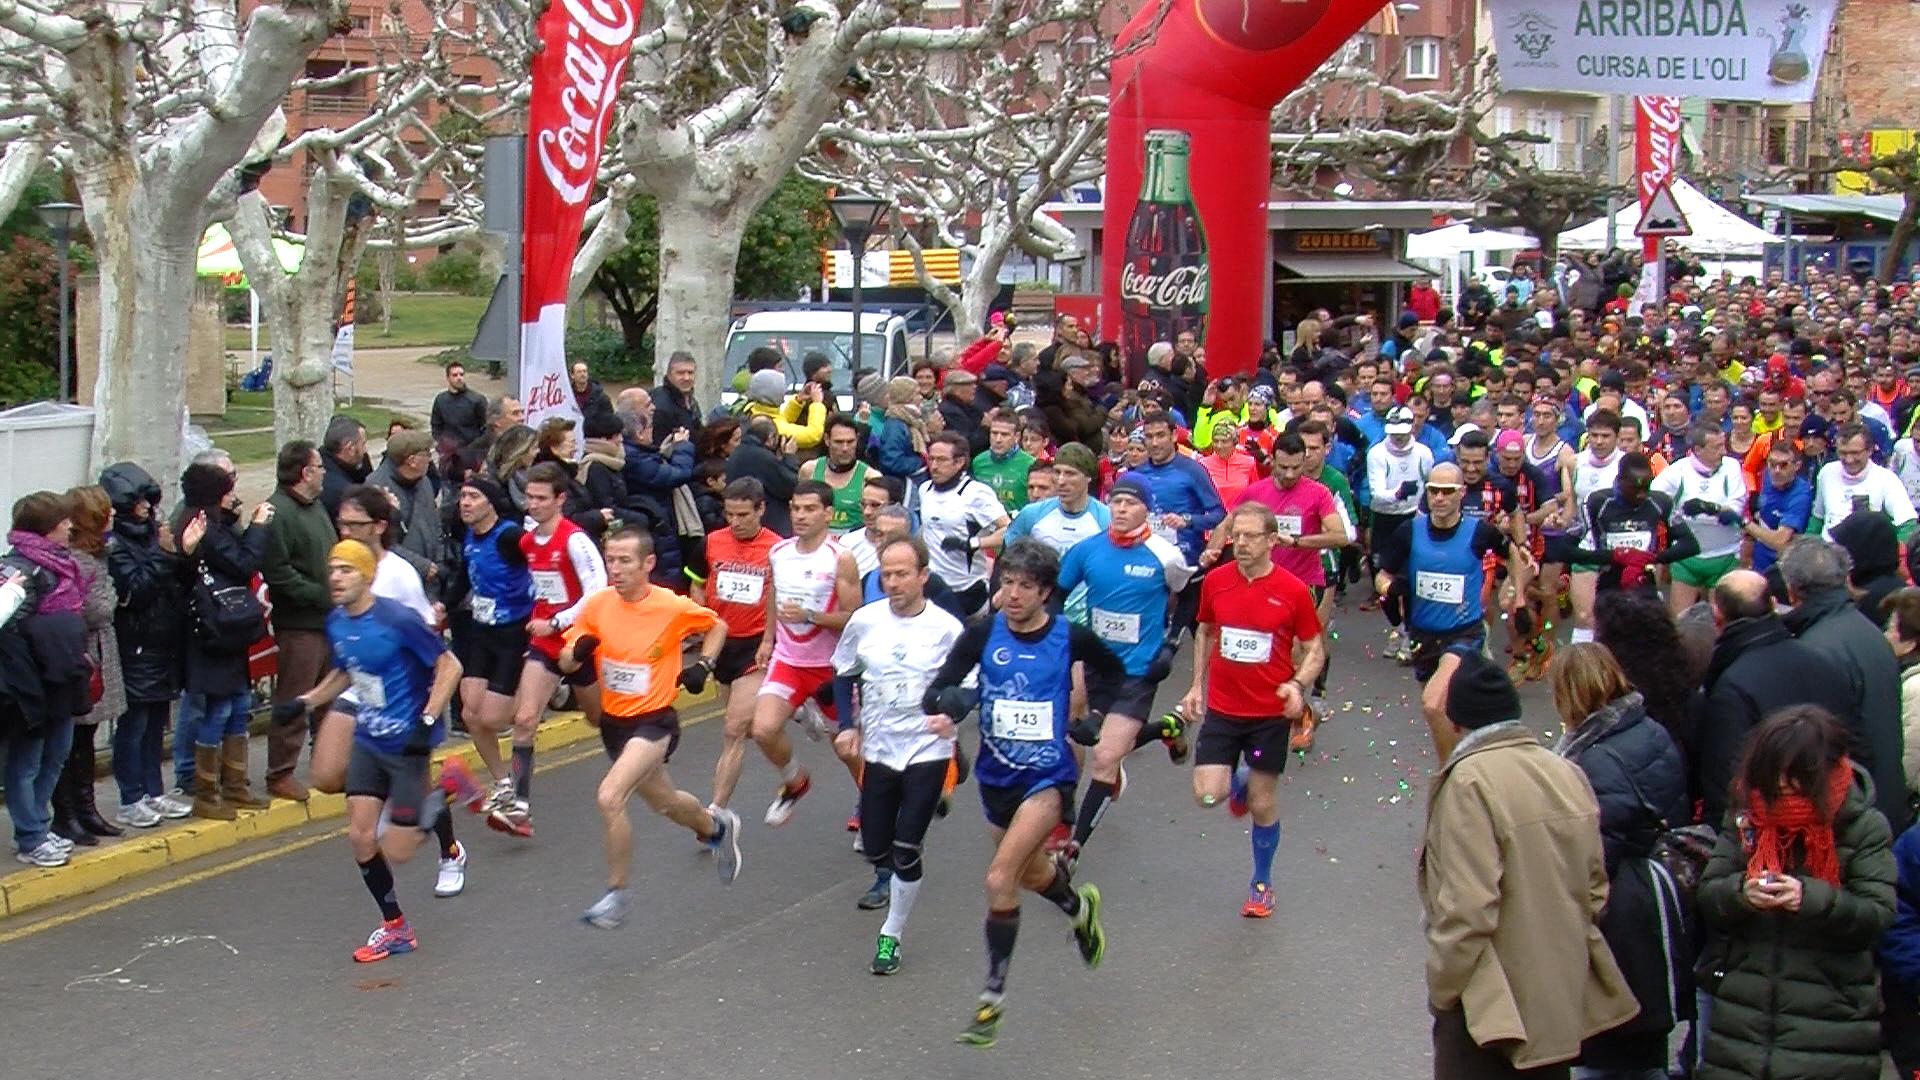 X cursa de l'oli-2013